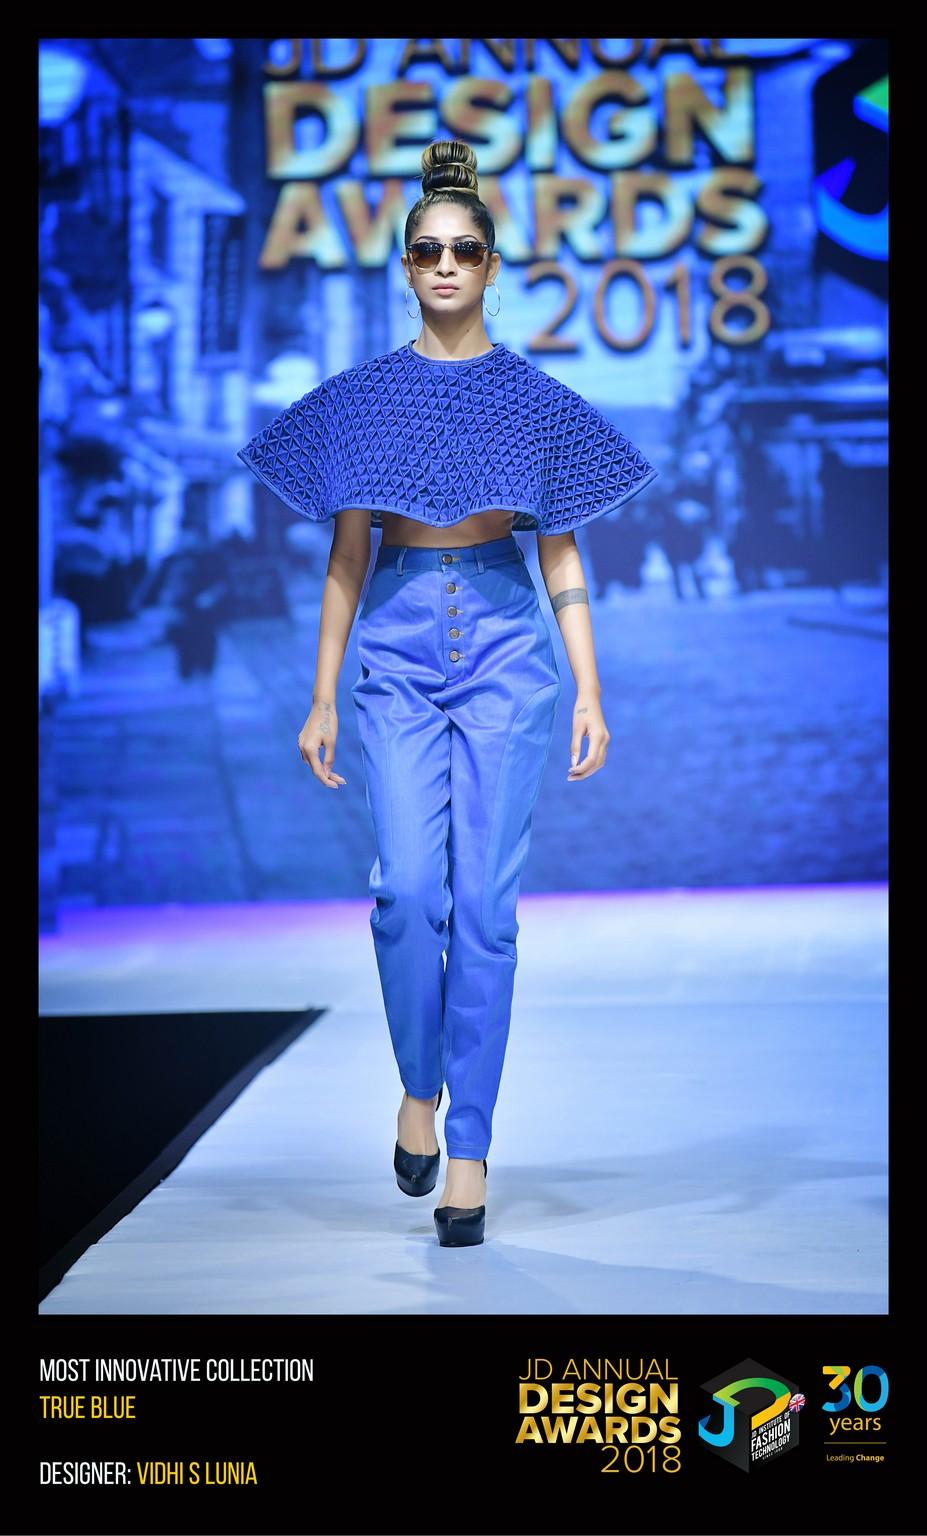 True Blue – Change – JD Annual Design Awards 2018 | Designer: Vidhi Lunia (ADFD 2015) | Photography : Jerin Nath (@jerin_nath) true blue - True Blue Photos JDW FB6 - True Blue – Change – JD Annual Design Awards 2018